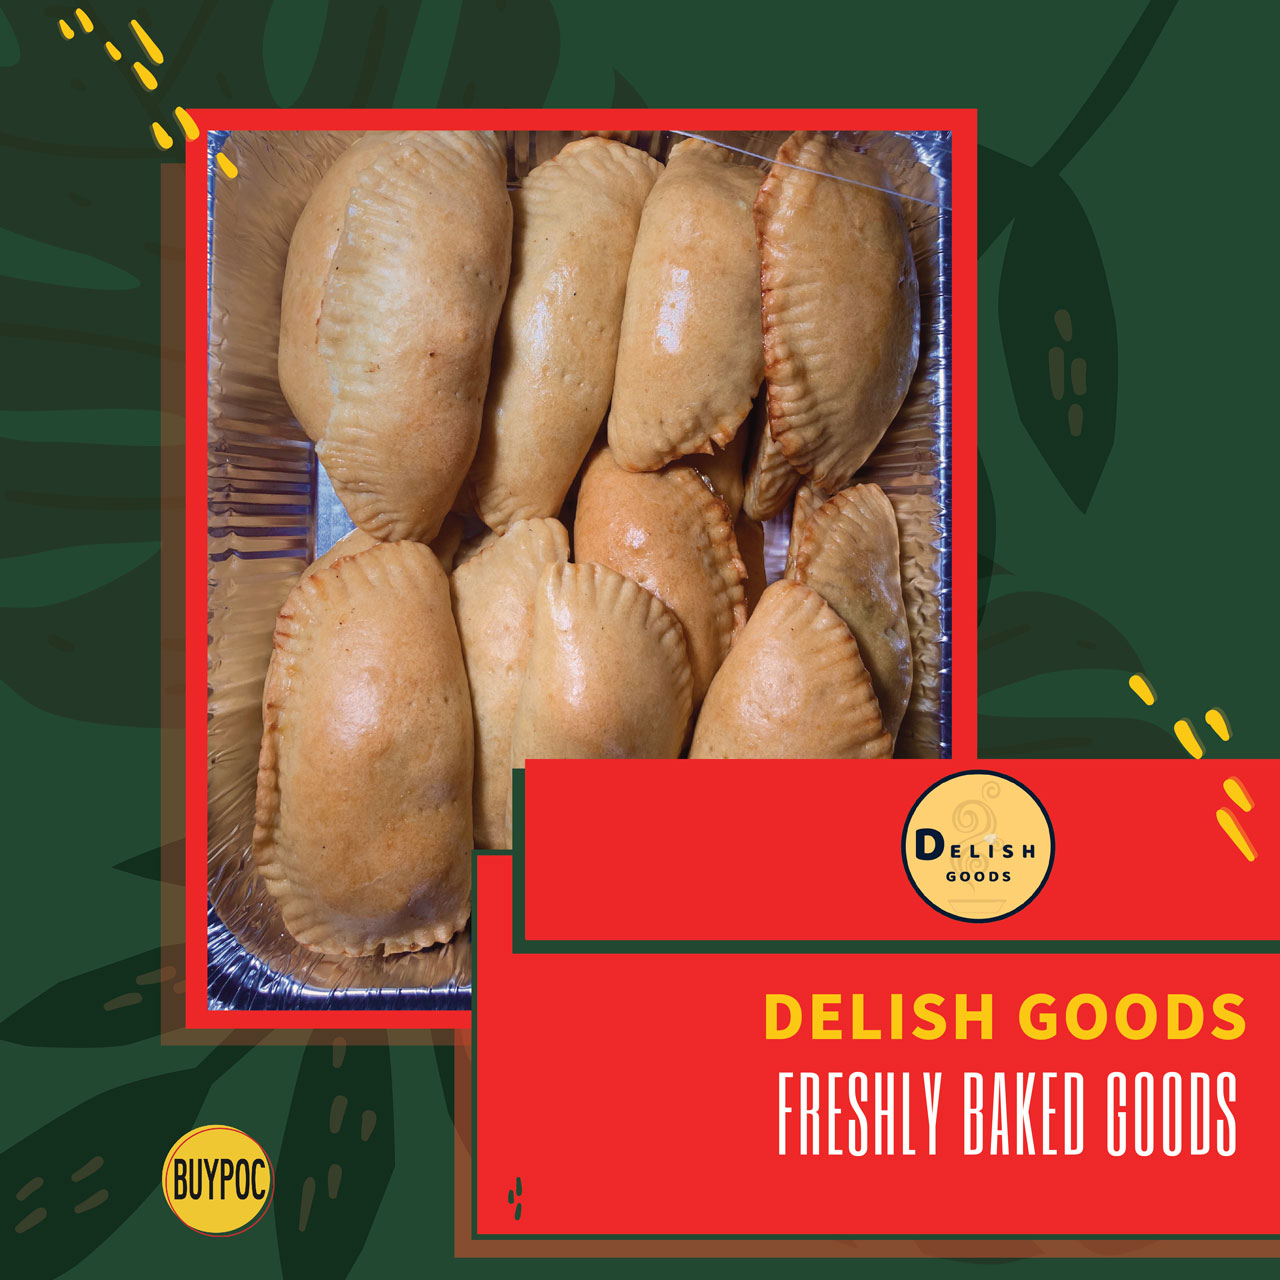 Delish Goods